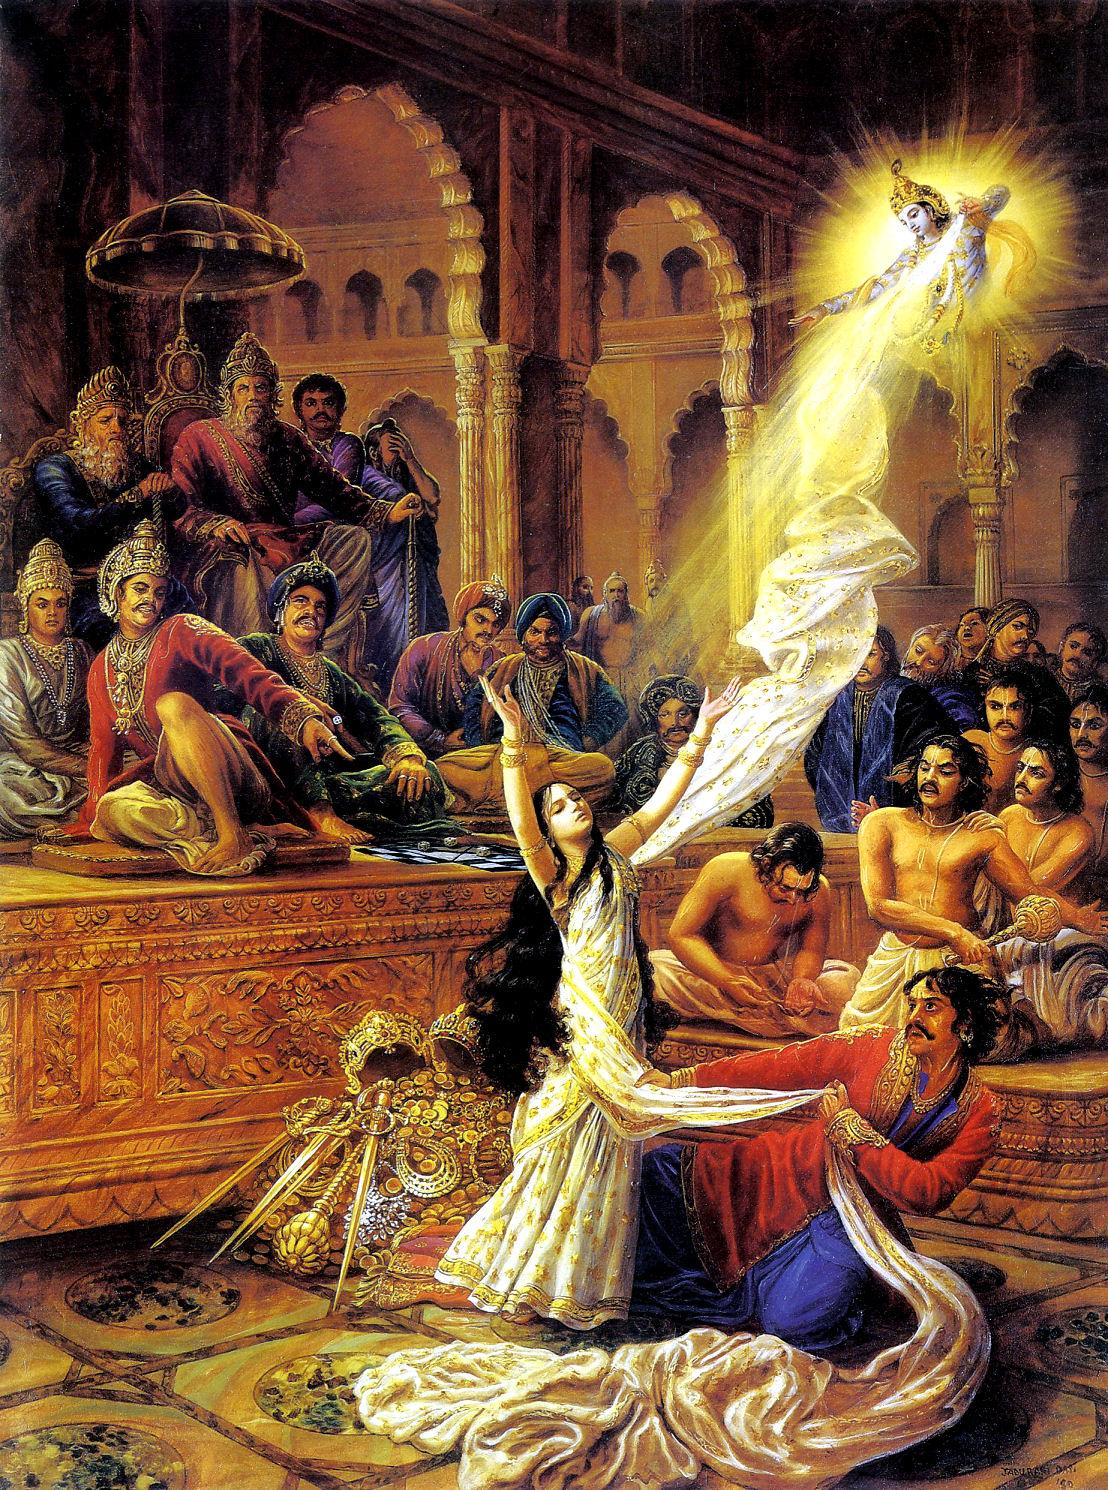 Махабхарата - Кришна спасает честь Драупади